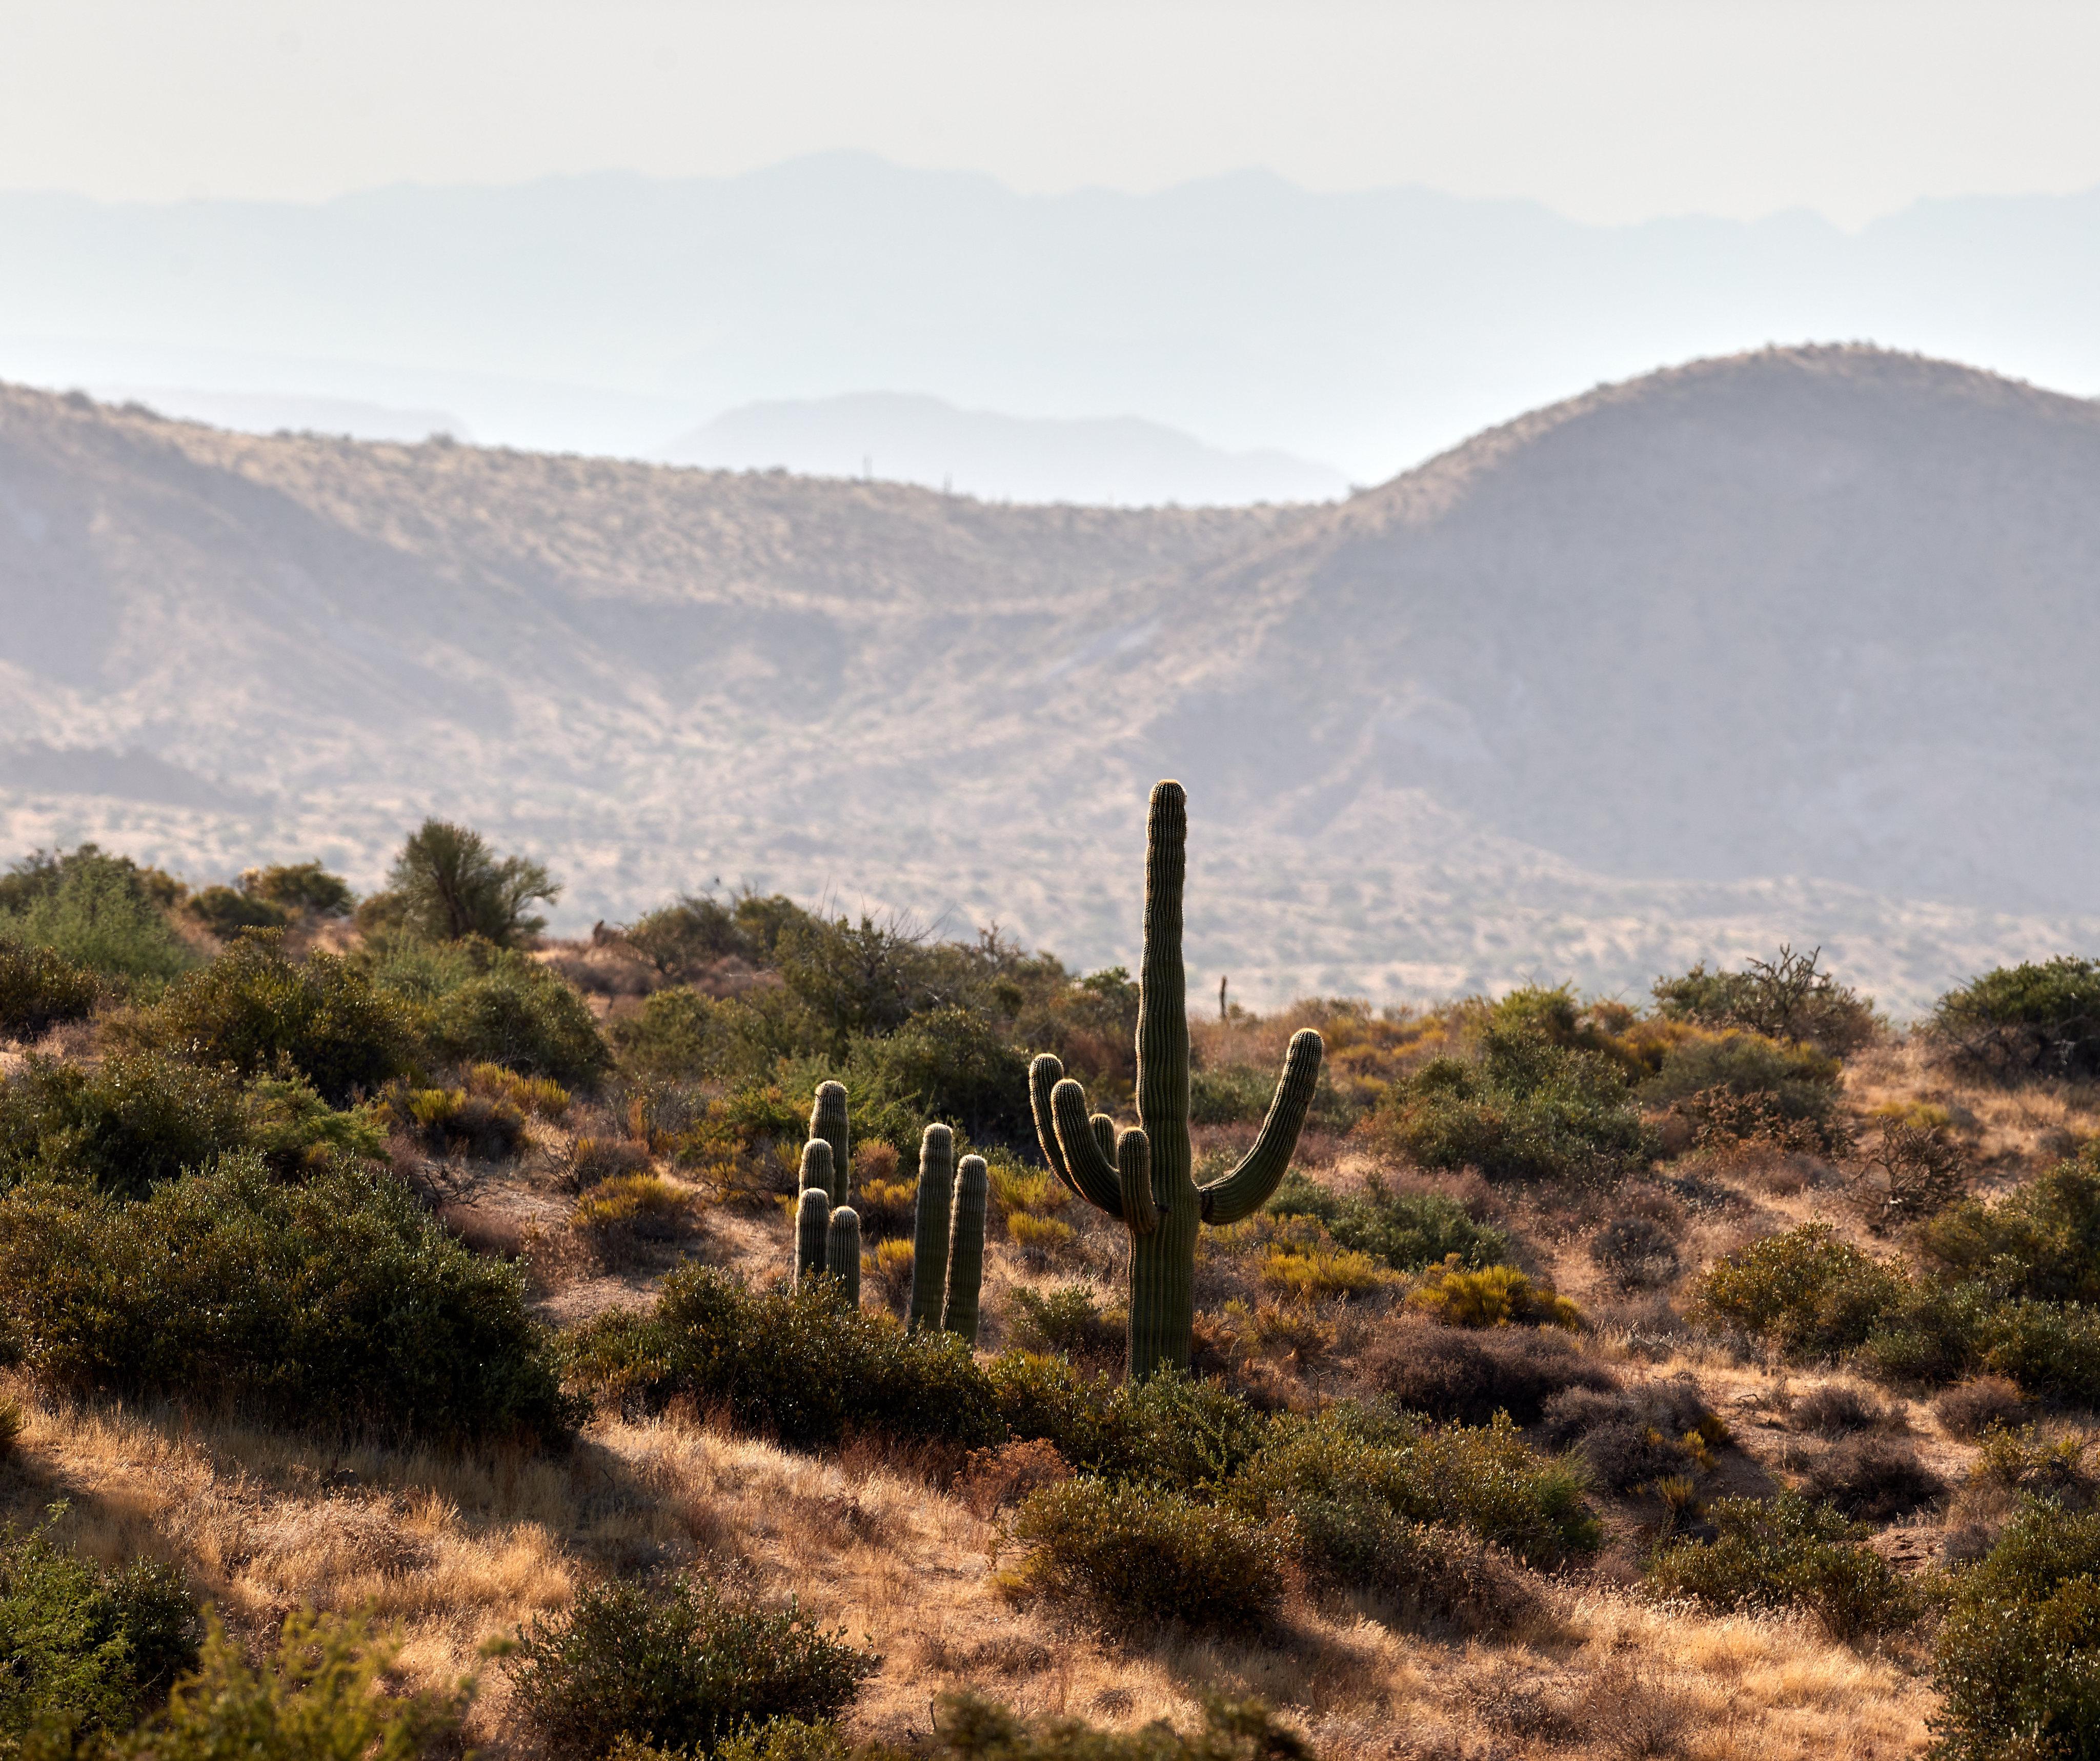 140341 descargar fondo de pantalla Naturaleza, Cactus, Cacto, Pradera, Las Colinas, Colinas, Dahl, Distancia, Arbusto: protectores de pantalla e imágenes gratis